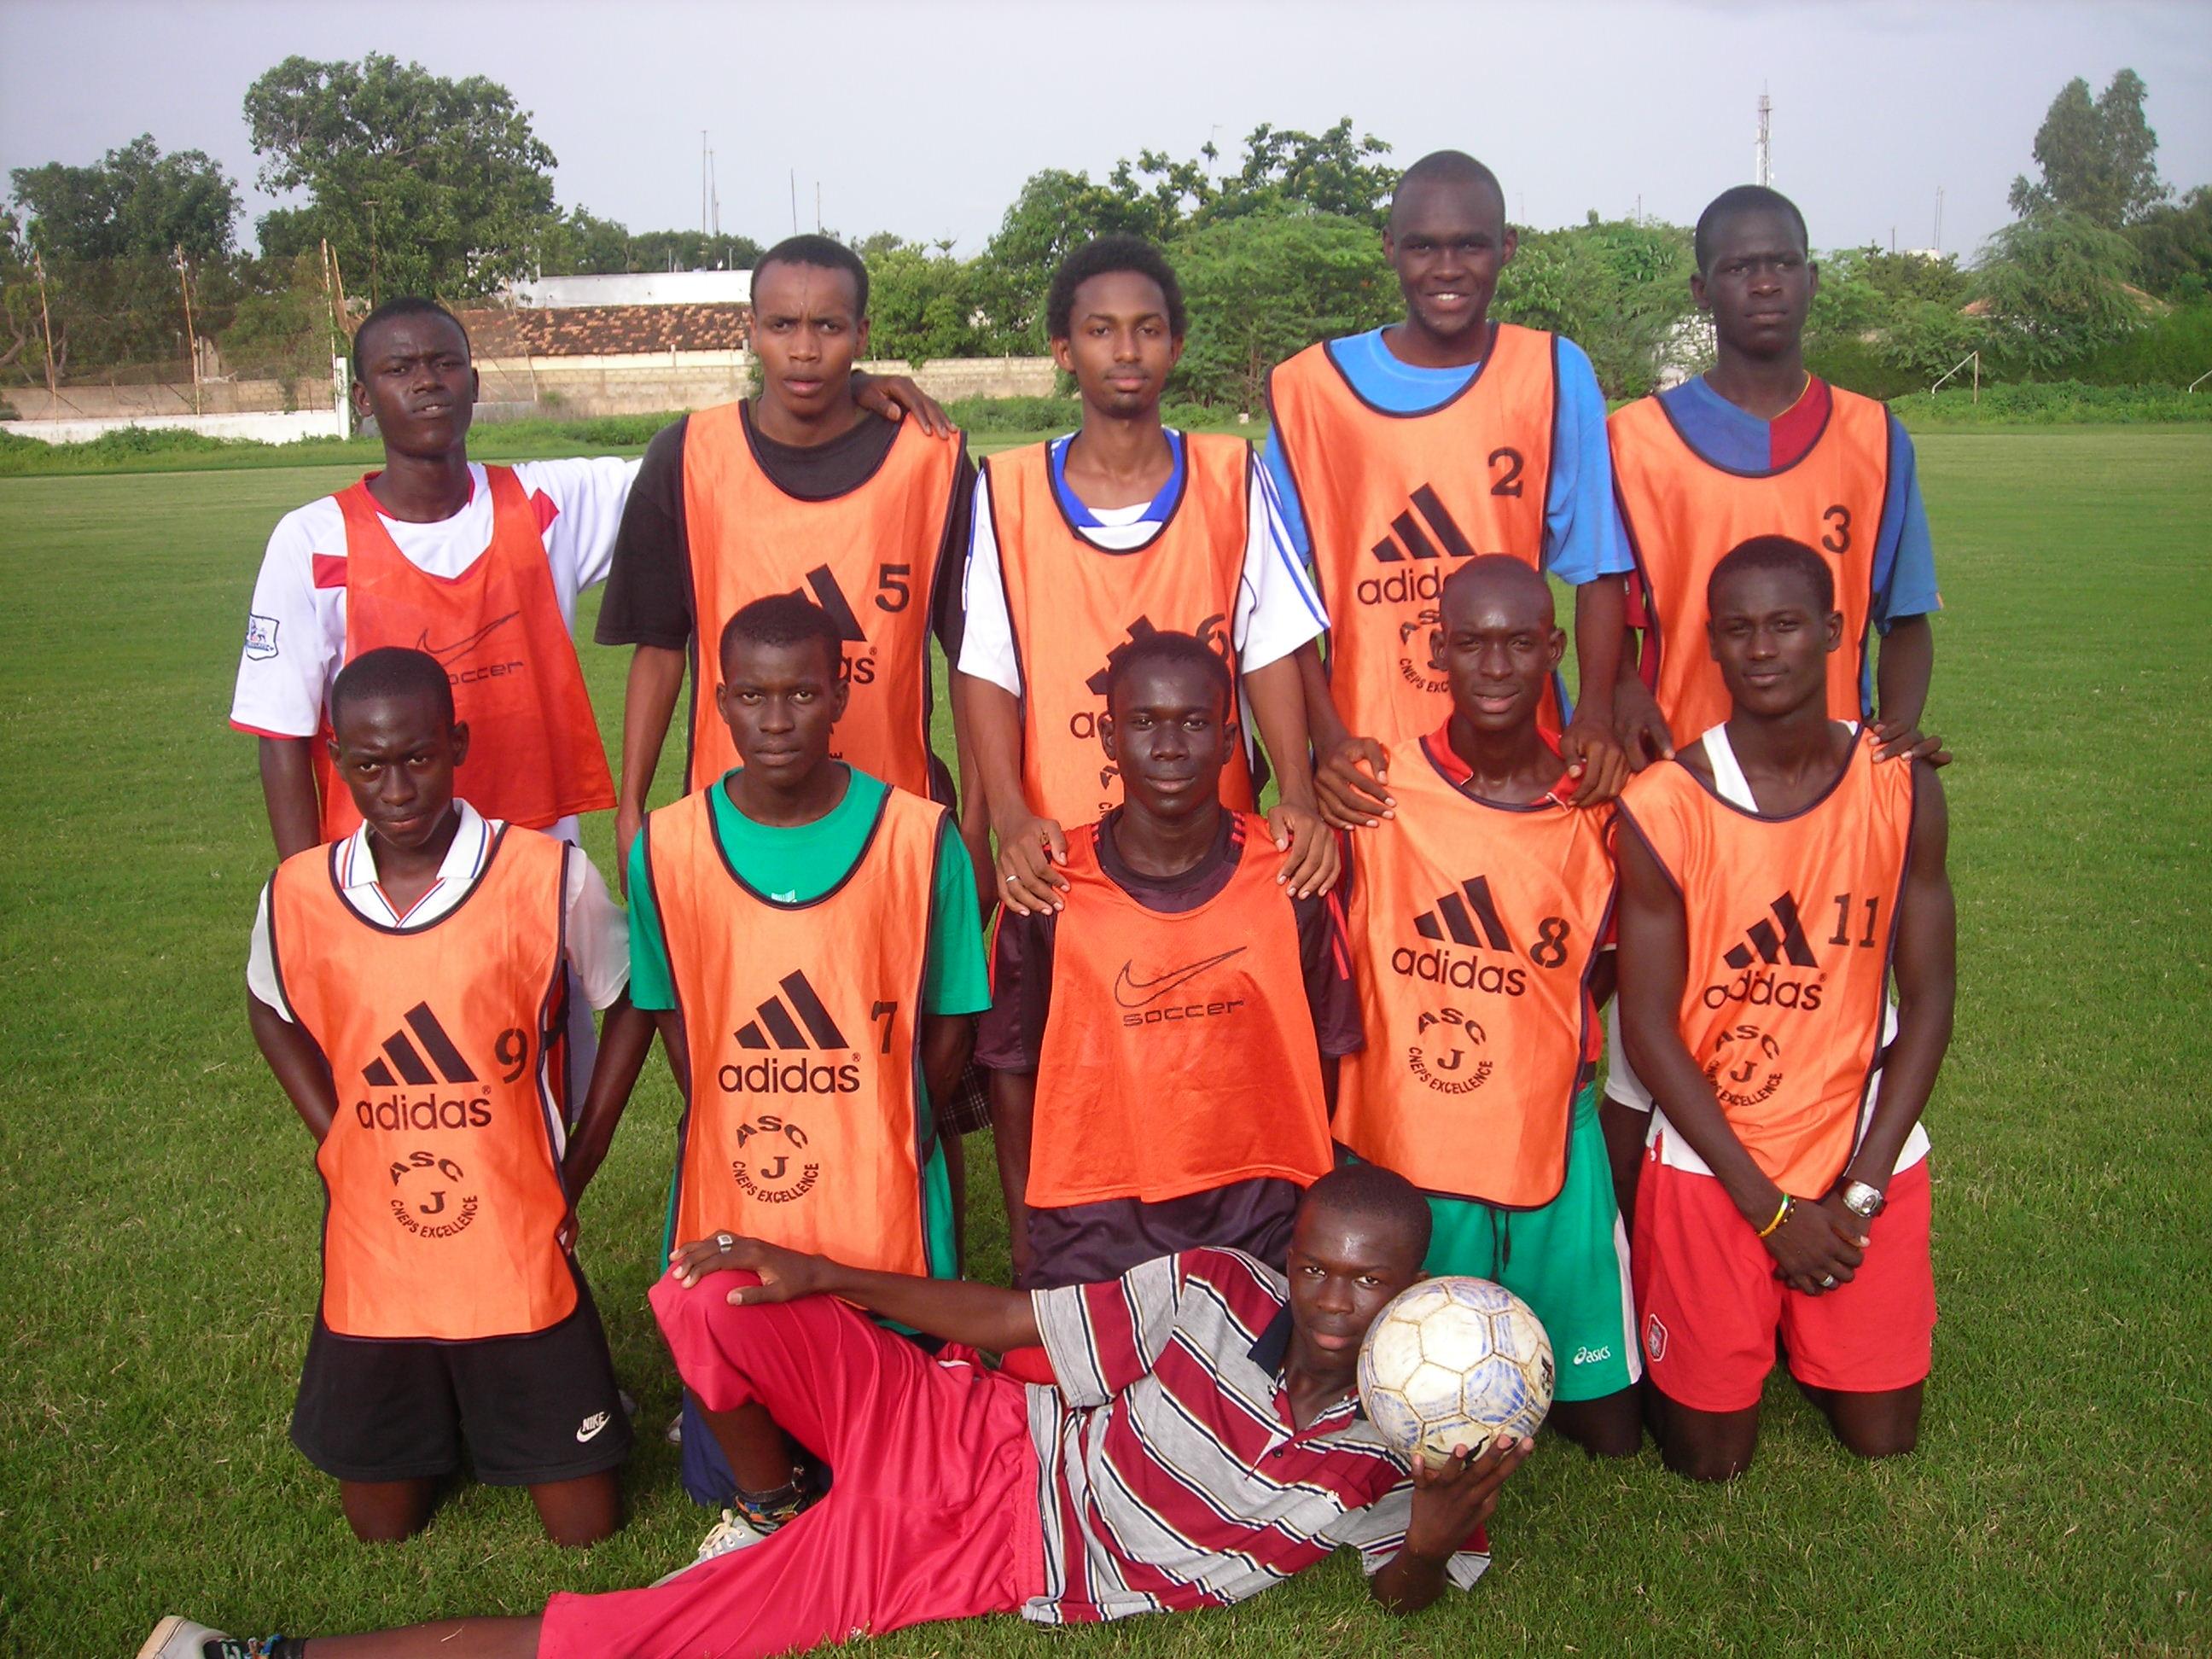 sportmanko@hotmail.com http://www.footballmercato.com/en_ccjad_11480